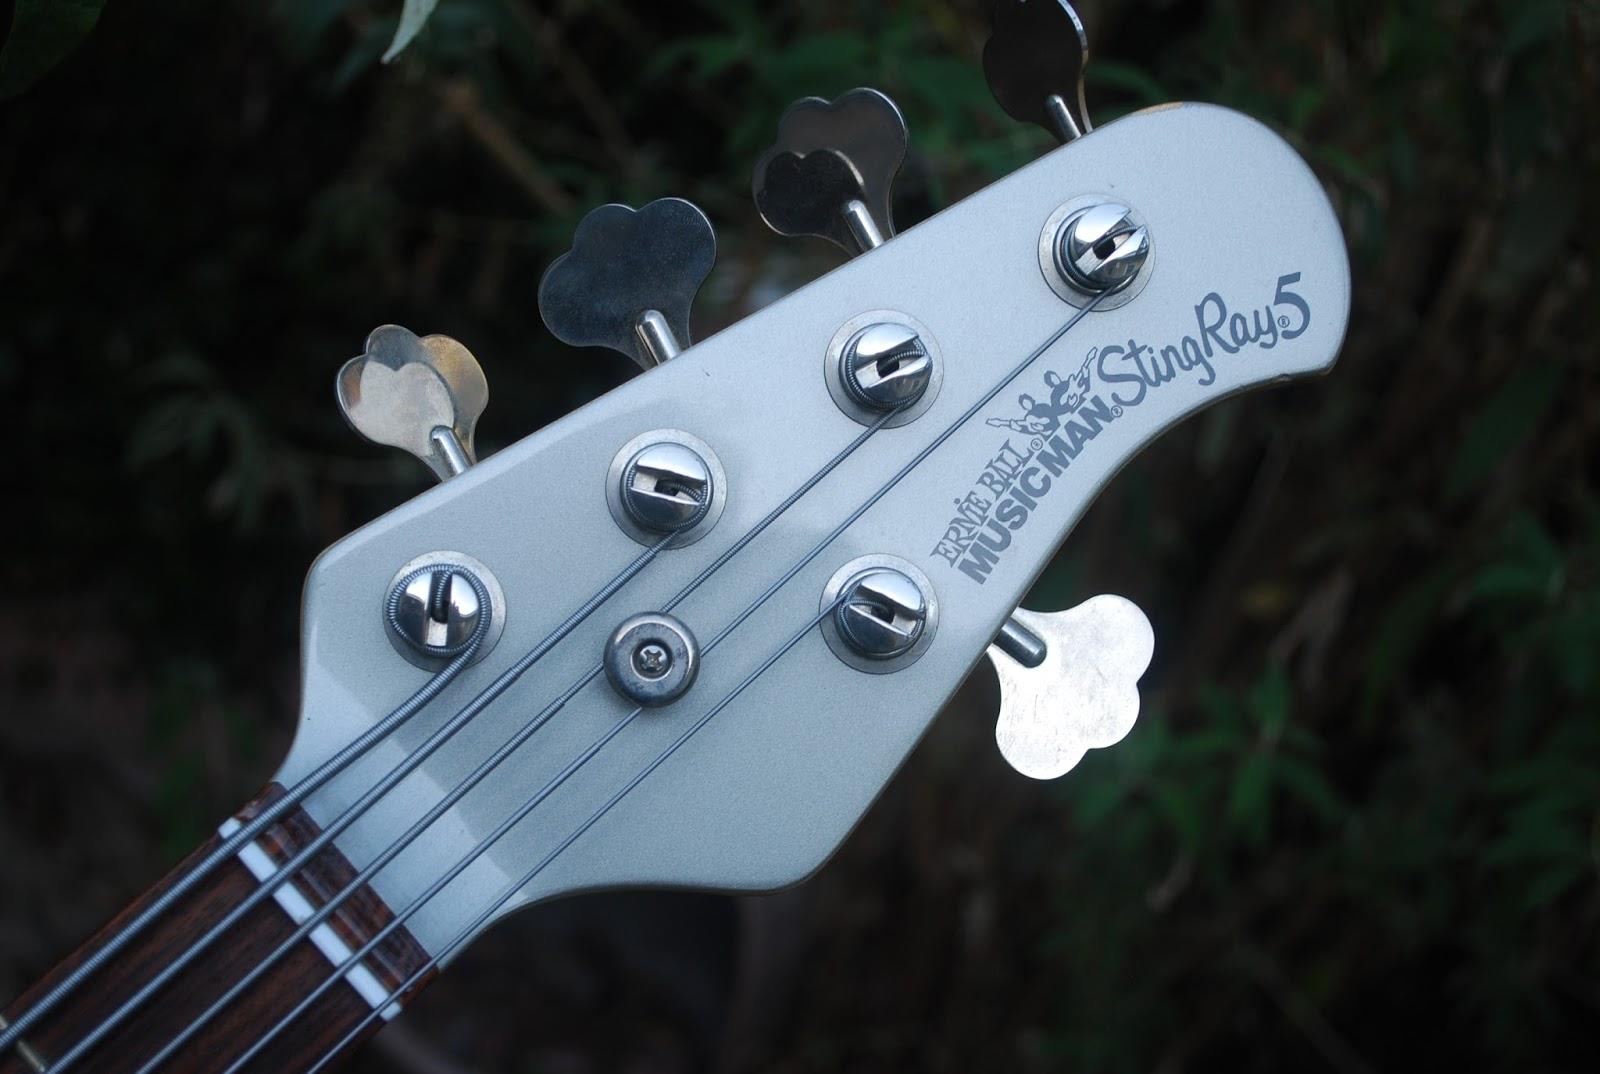 Rex and the Bass: September 2015